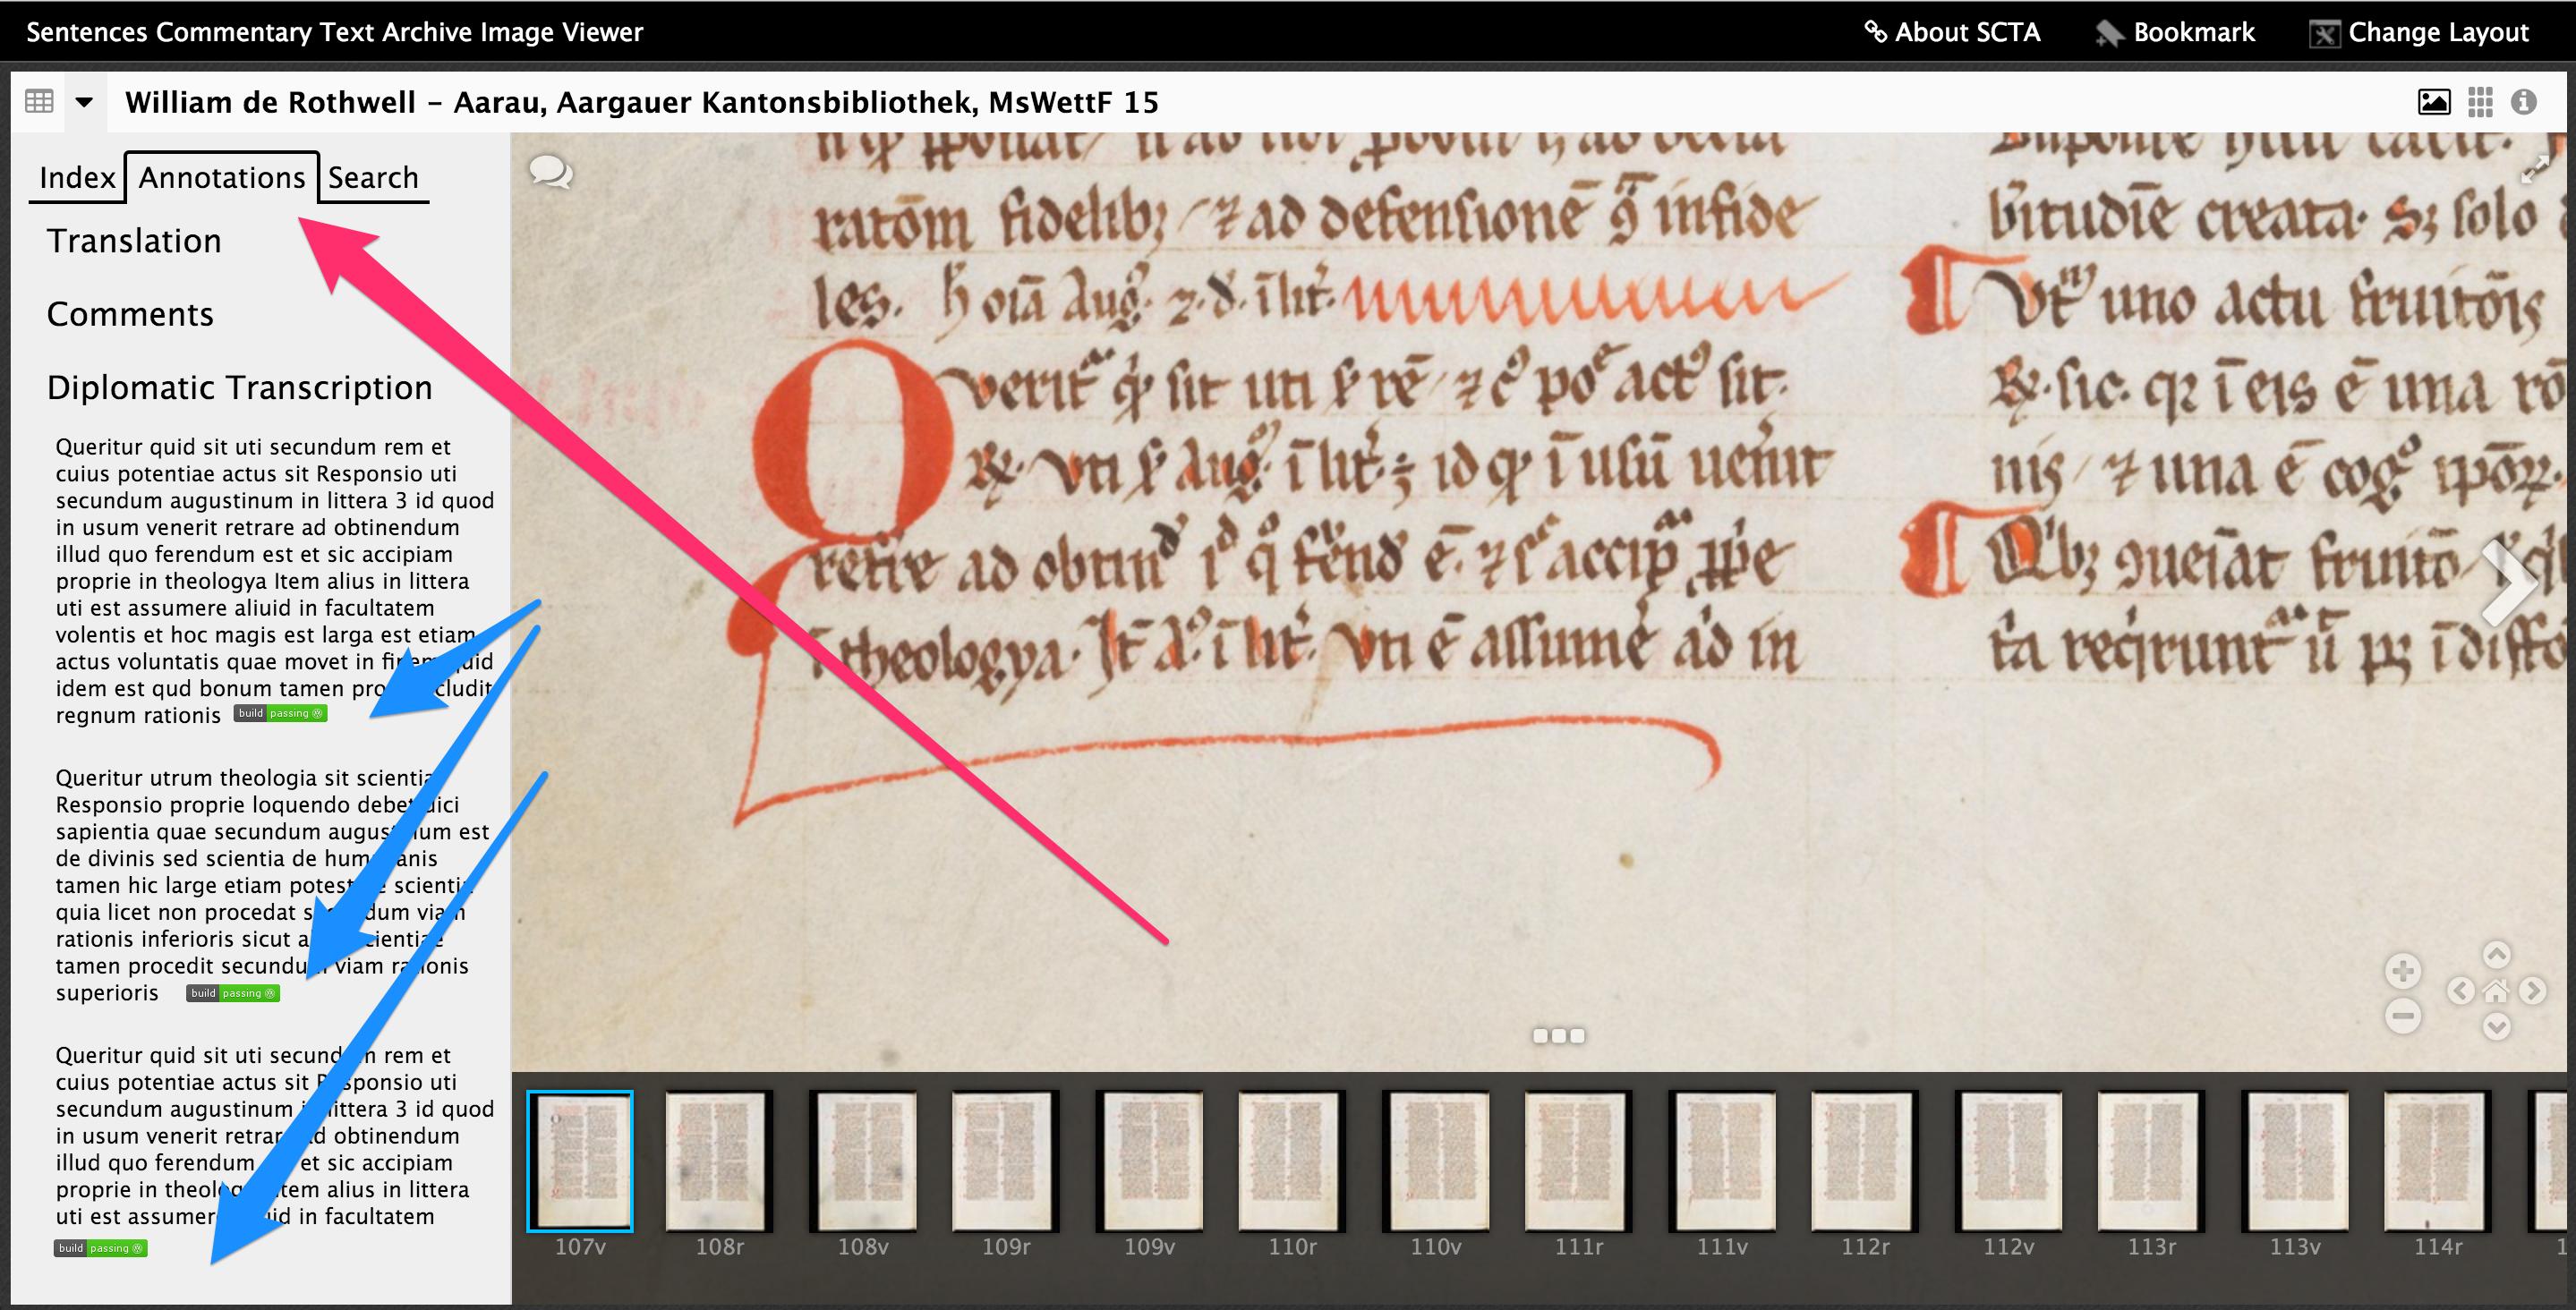 mirador-annotations